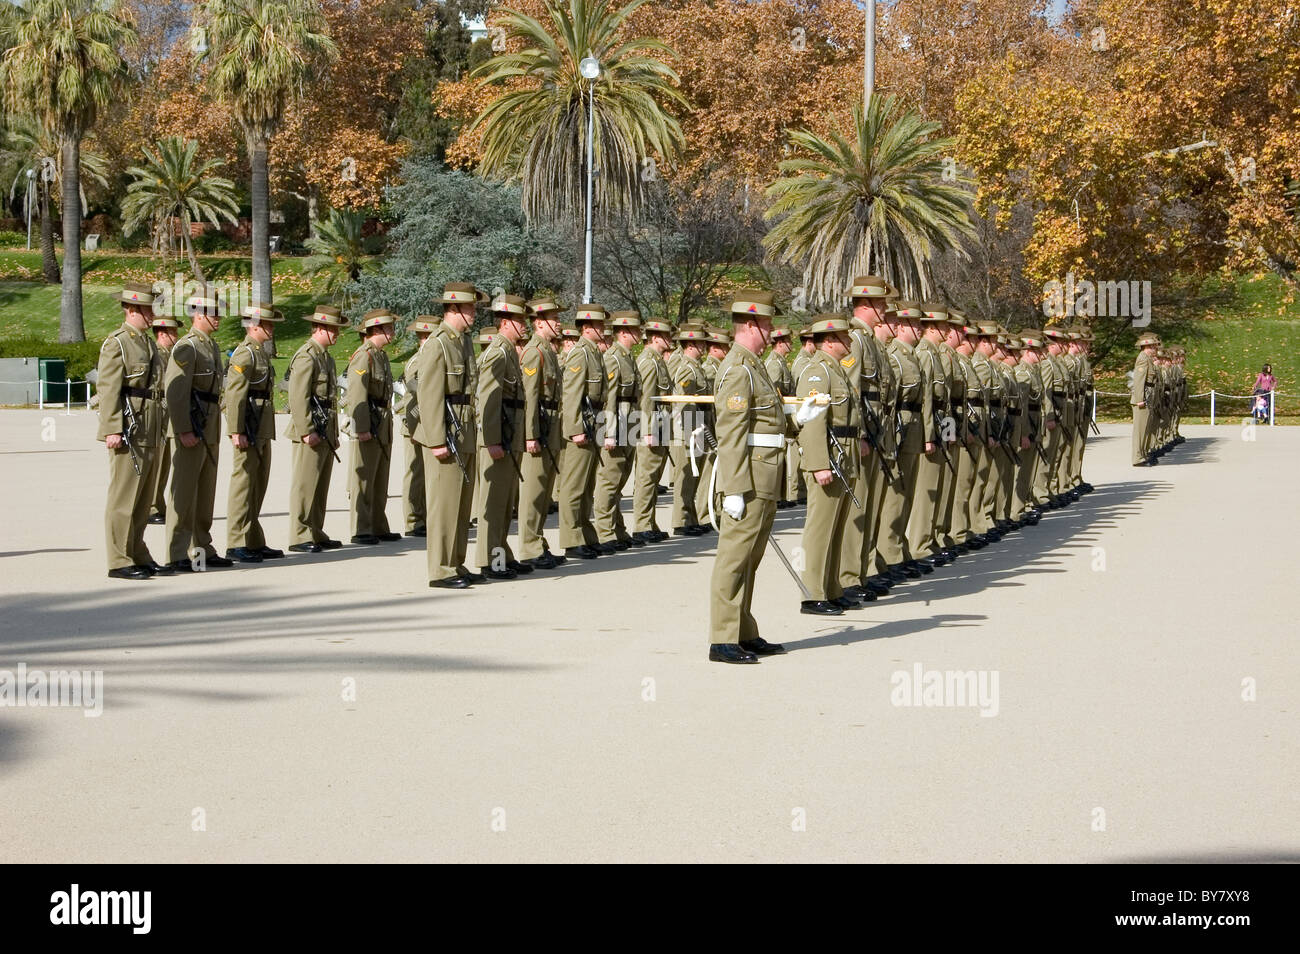 Australian Army personnel on parade, Torrens Parade Ground, Adelaide, South Australia. Stock Photo